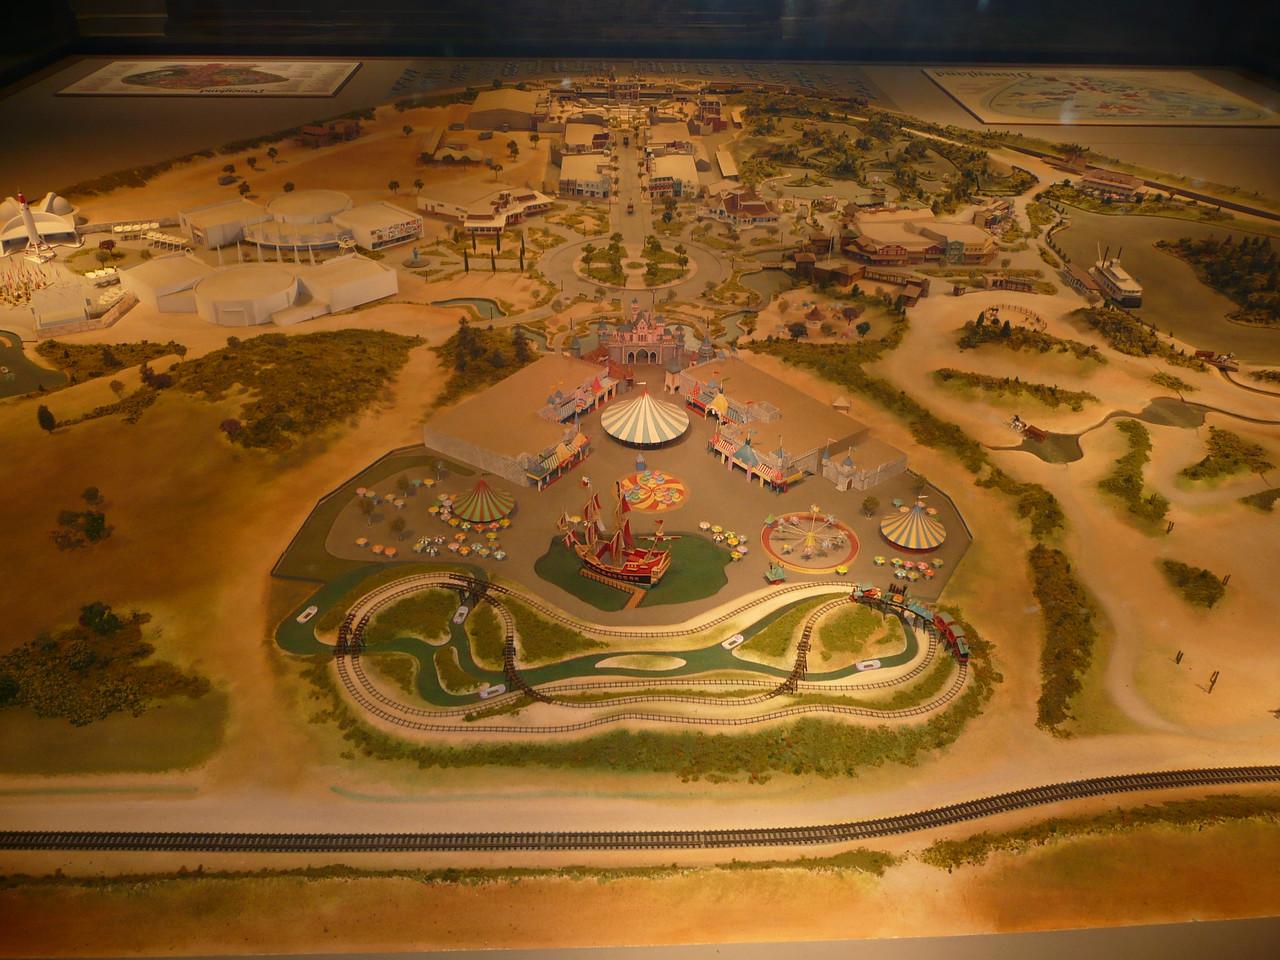 A model of Disneyland in 1955.